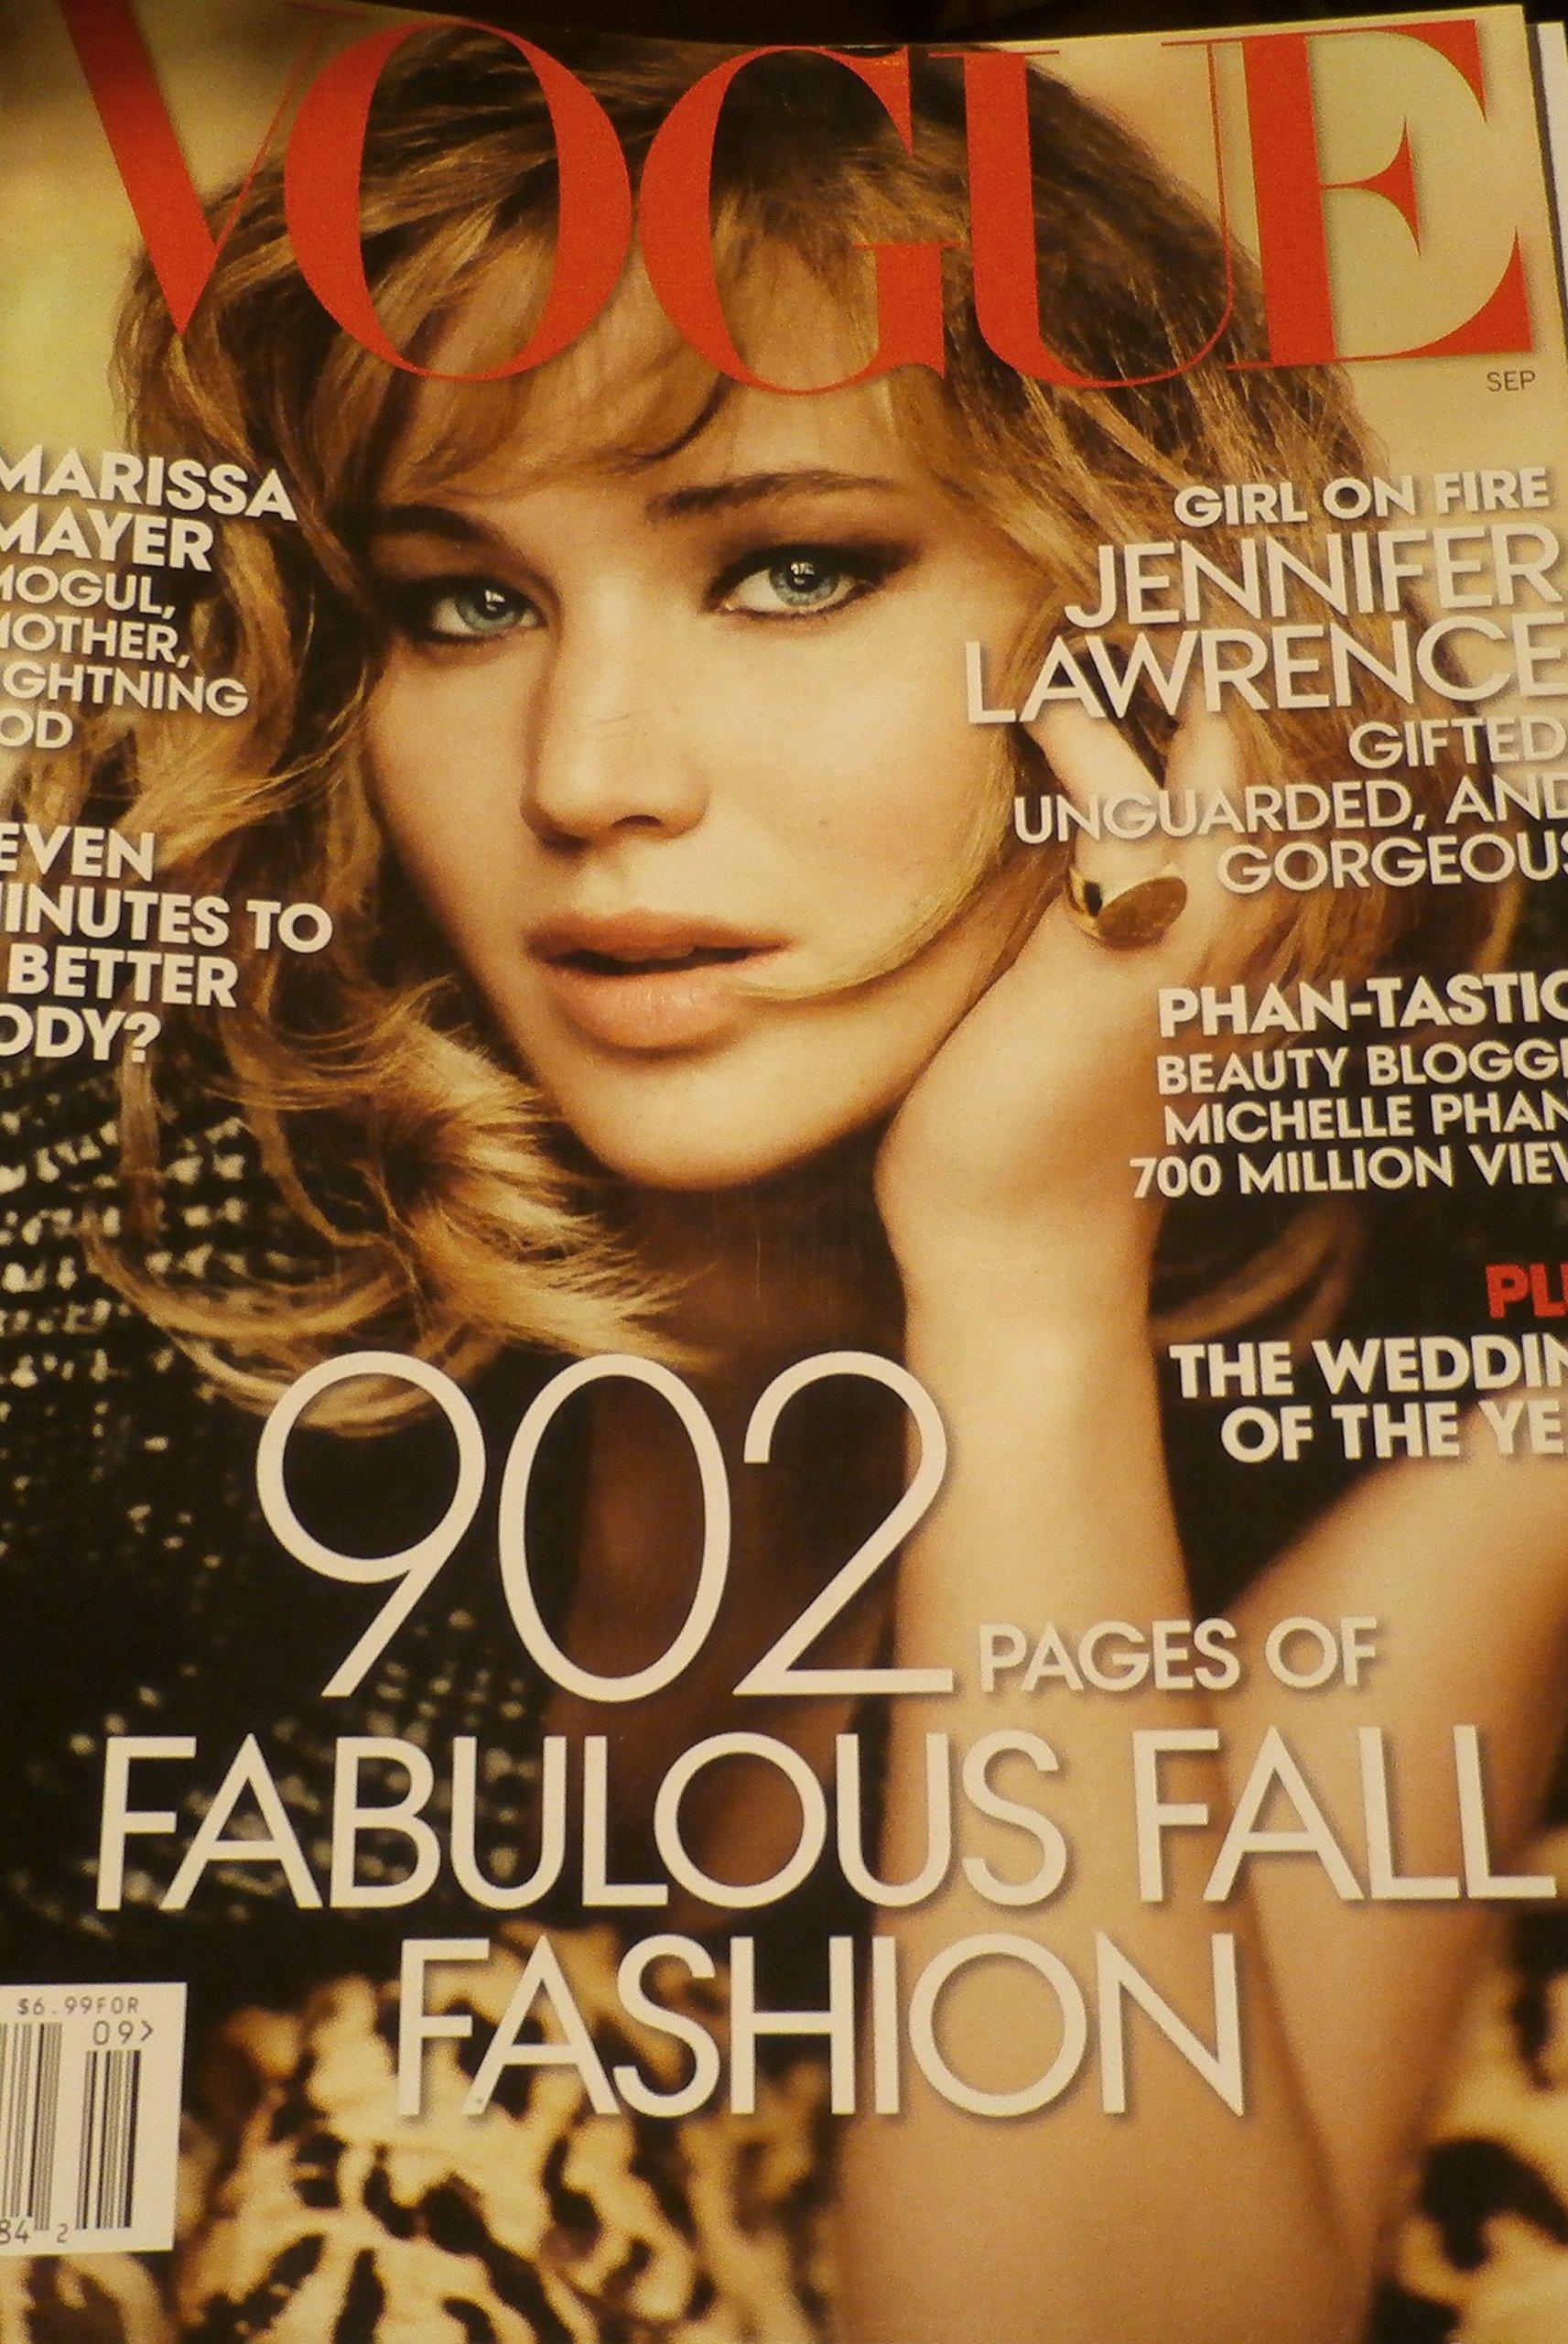 Vogue Magazine September 2013 Jennifer Lawrence Catching Fire, etc: Amazon.es: vogue: Libros